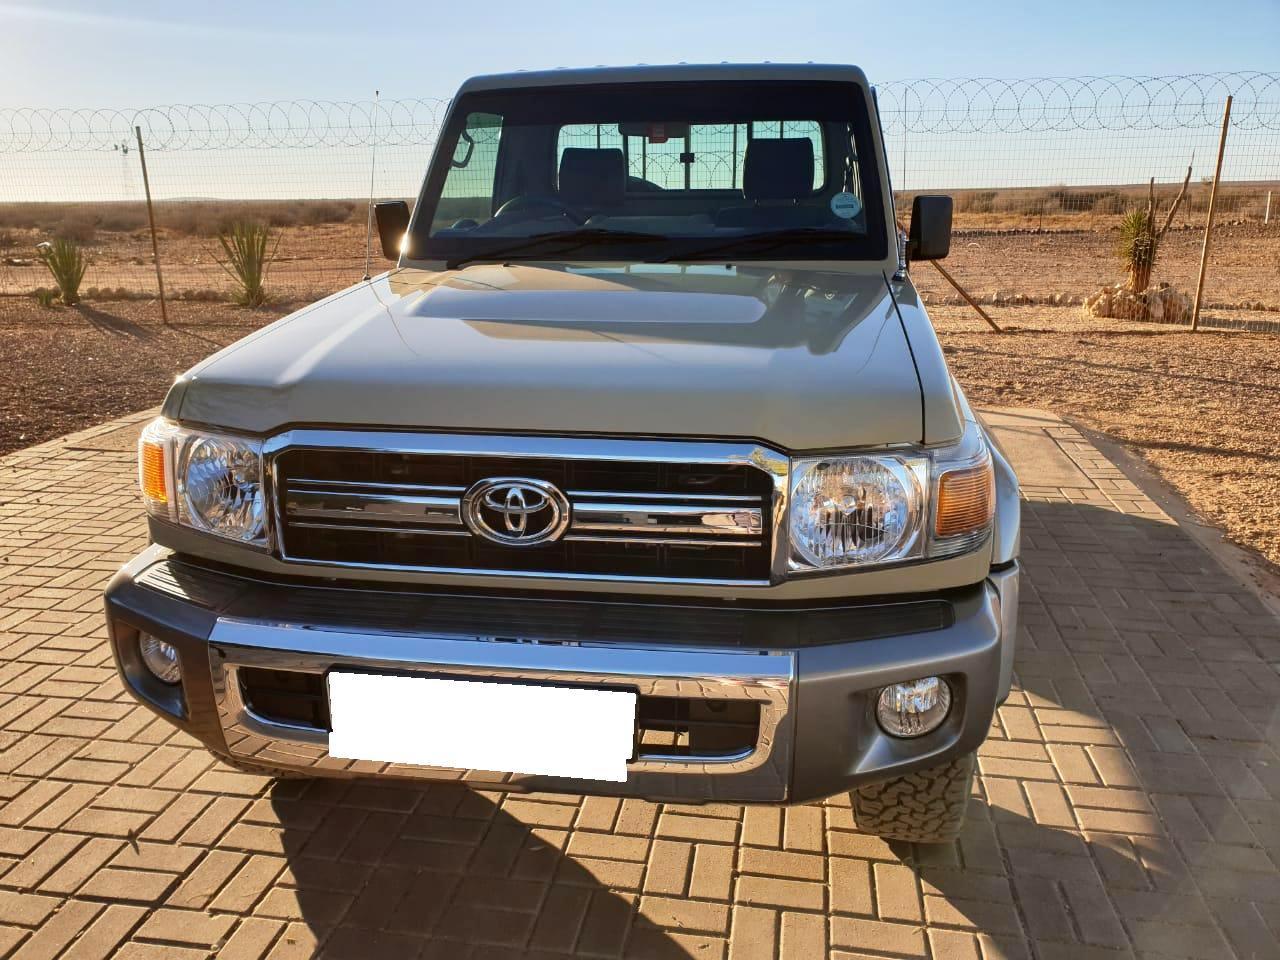 2016 Toyota Land Cruiser 79 single cab LAND CRUISER 79 4.0P P/U S/C